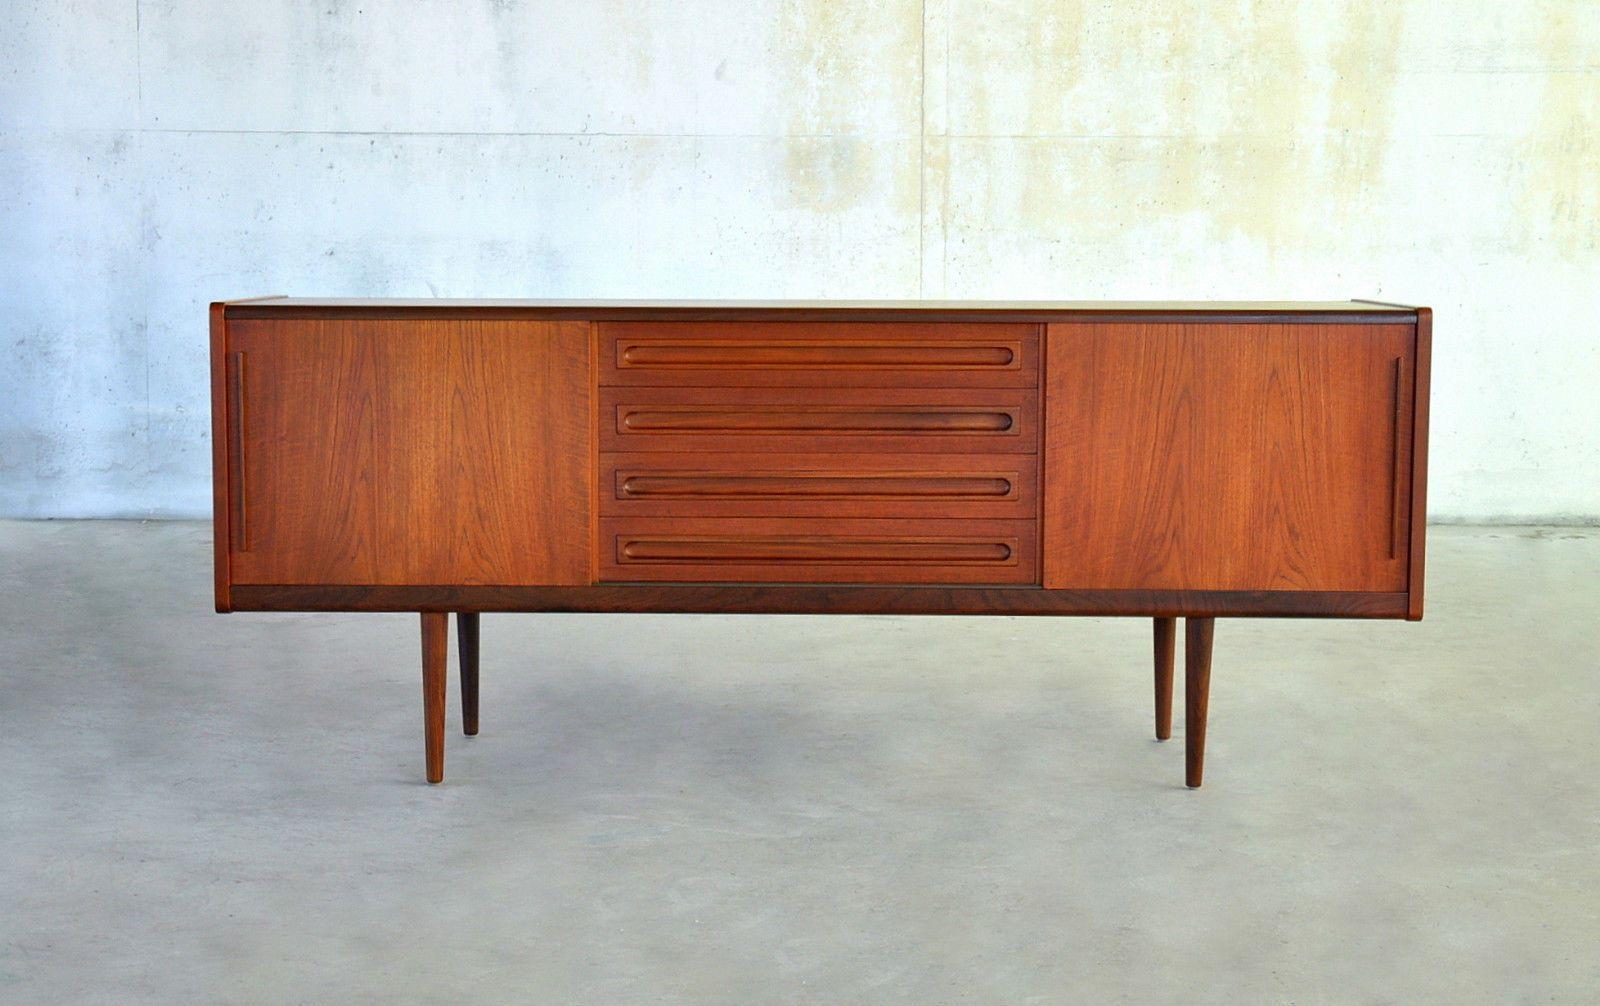 Danish Modern Teak Credenza : Mid century danish modern teak credenza sideboard buffet bar media